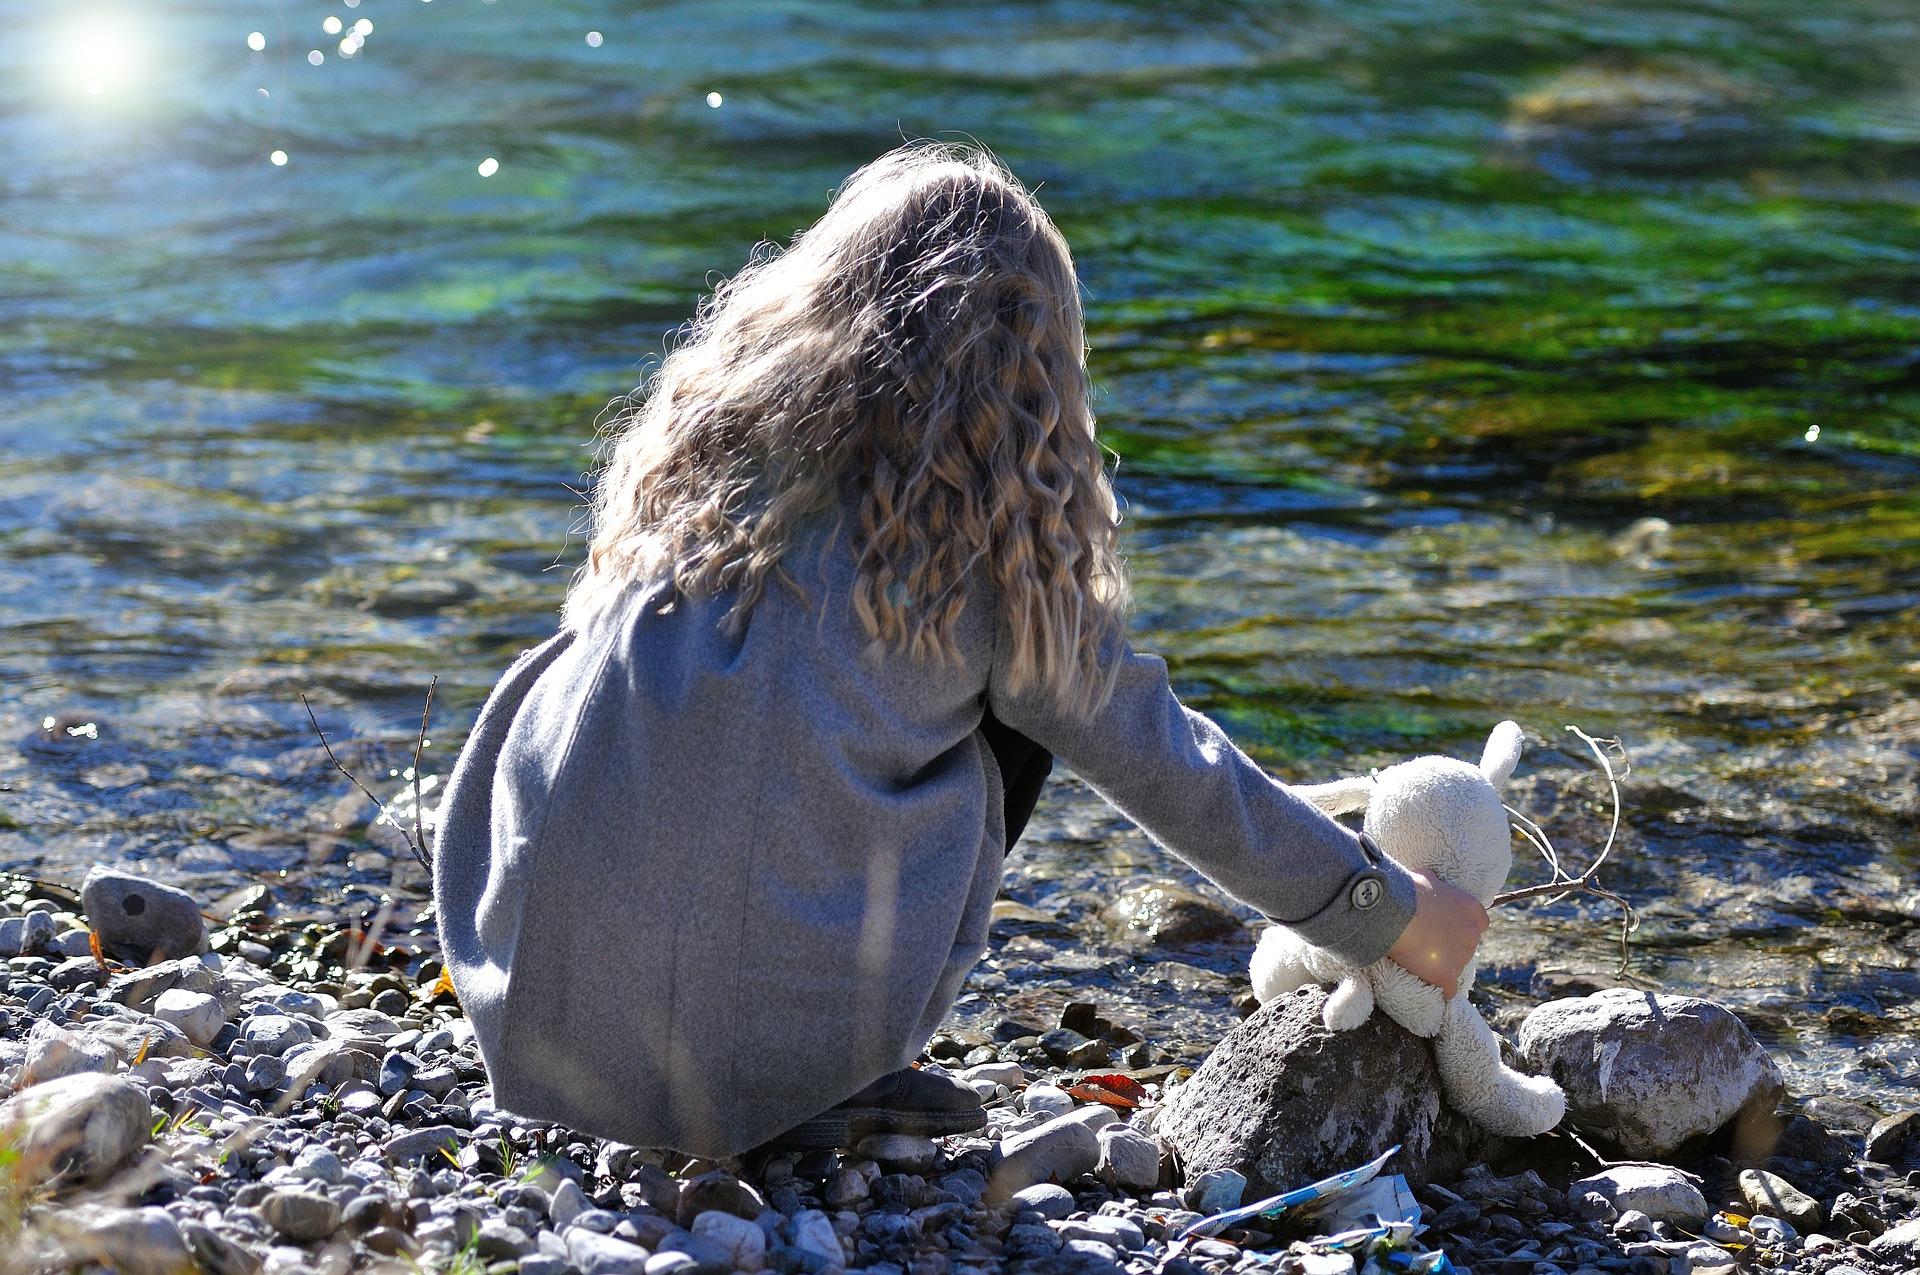 River, Adorable, Pose, Teen, Shore, HQ Photo